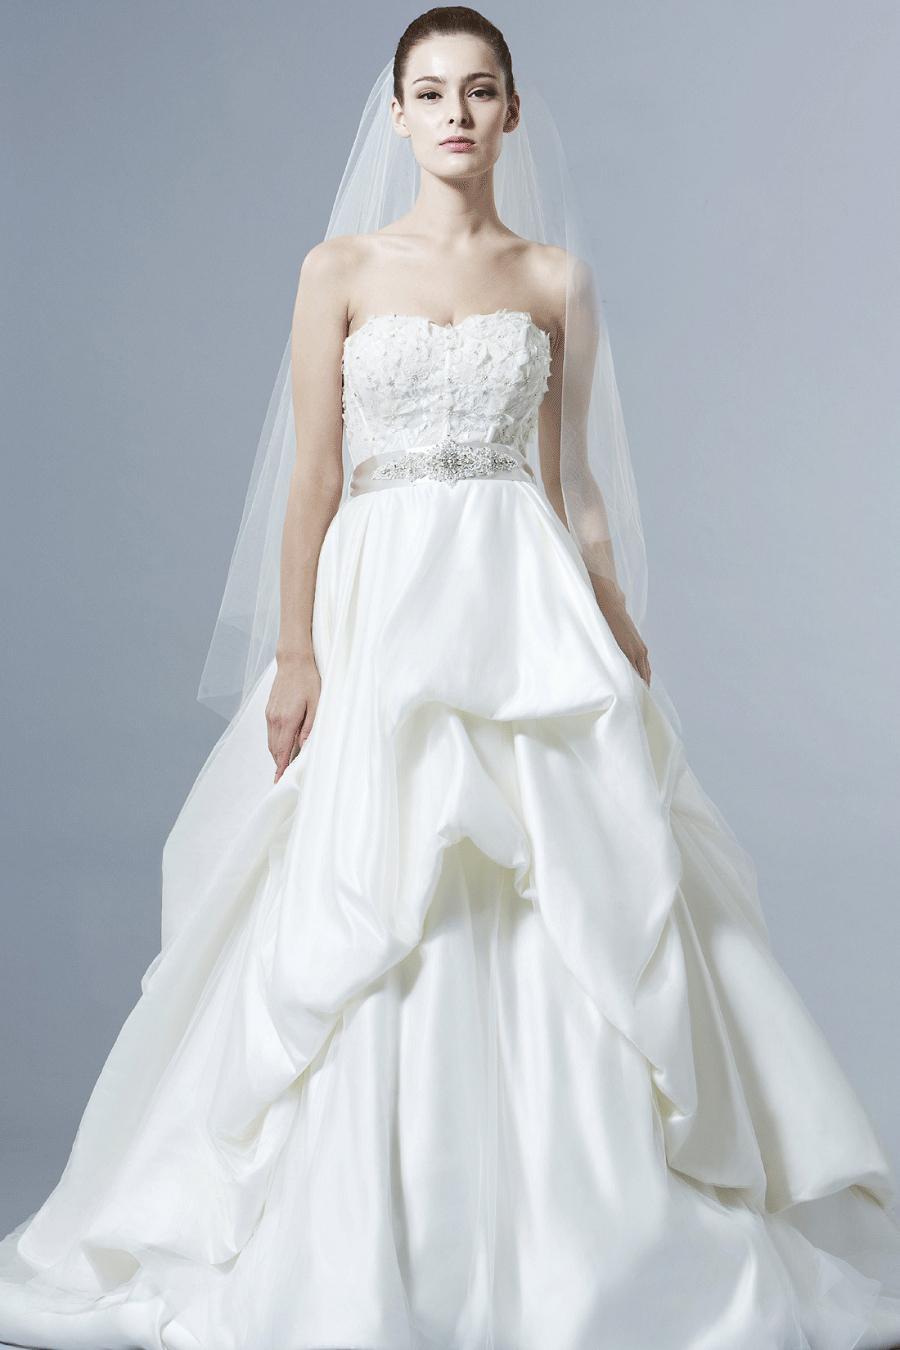 Elegant Flowers Beaded Crystal Sashes Wedding Dresses